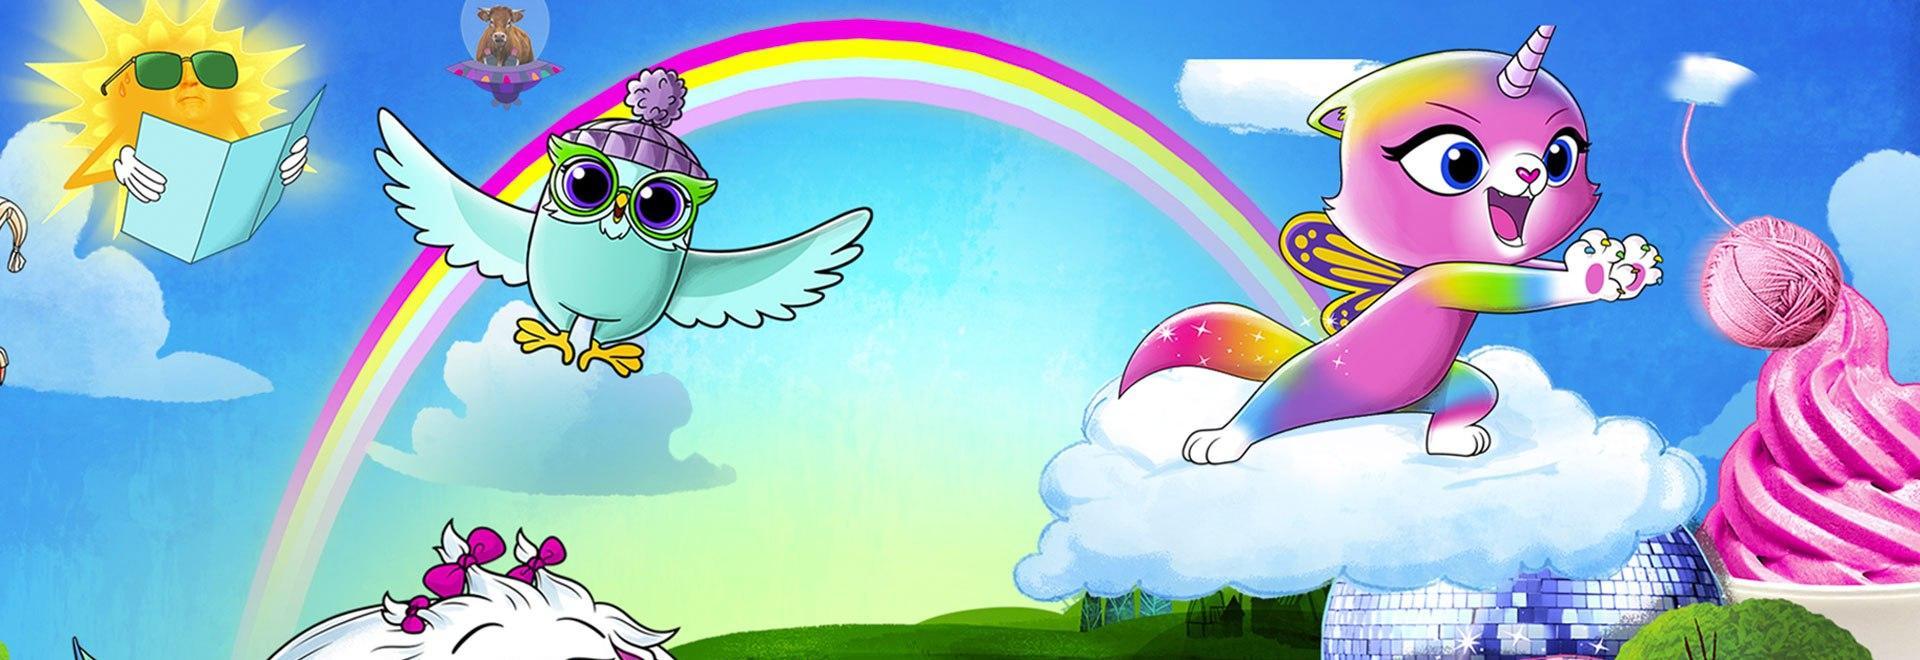 Mythic scout / Arcobaleno farfalla unicorno cupido